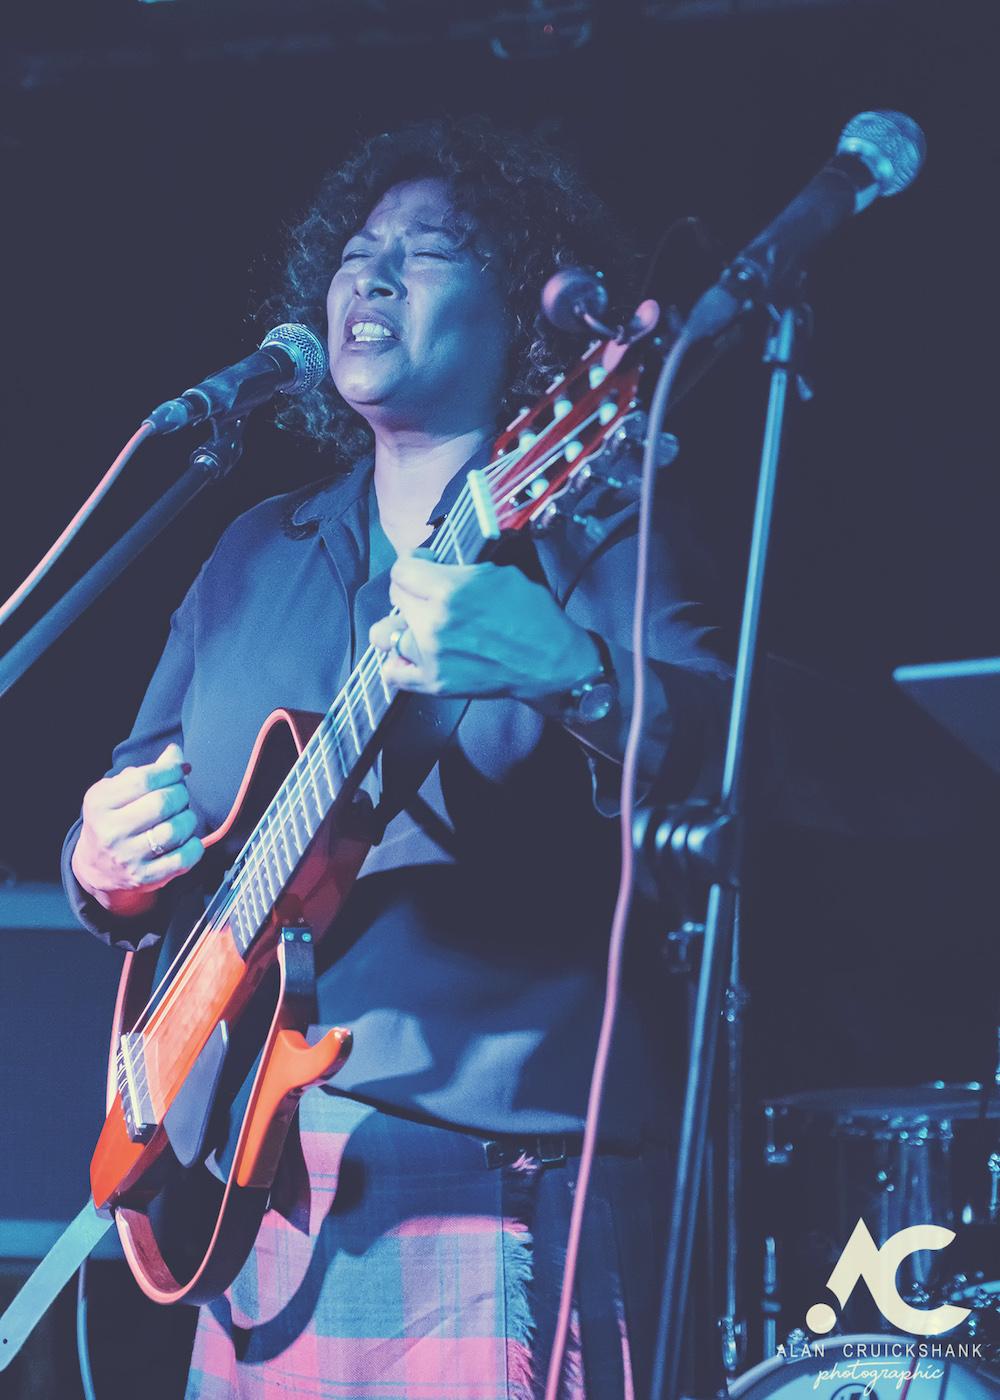 coca tenorio Inverness November 2018 7 - Tom McGuire & The Brassholes, 8/11/2018 - Images